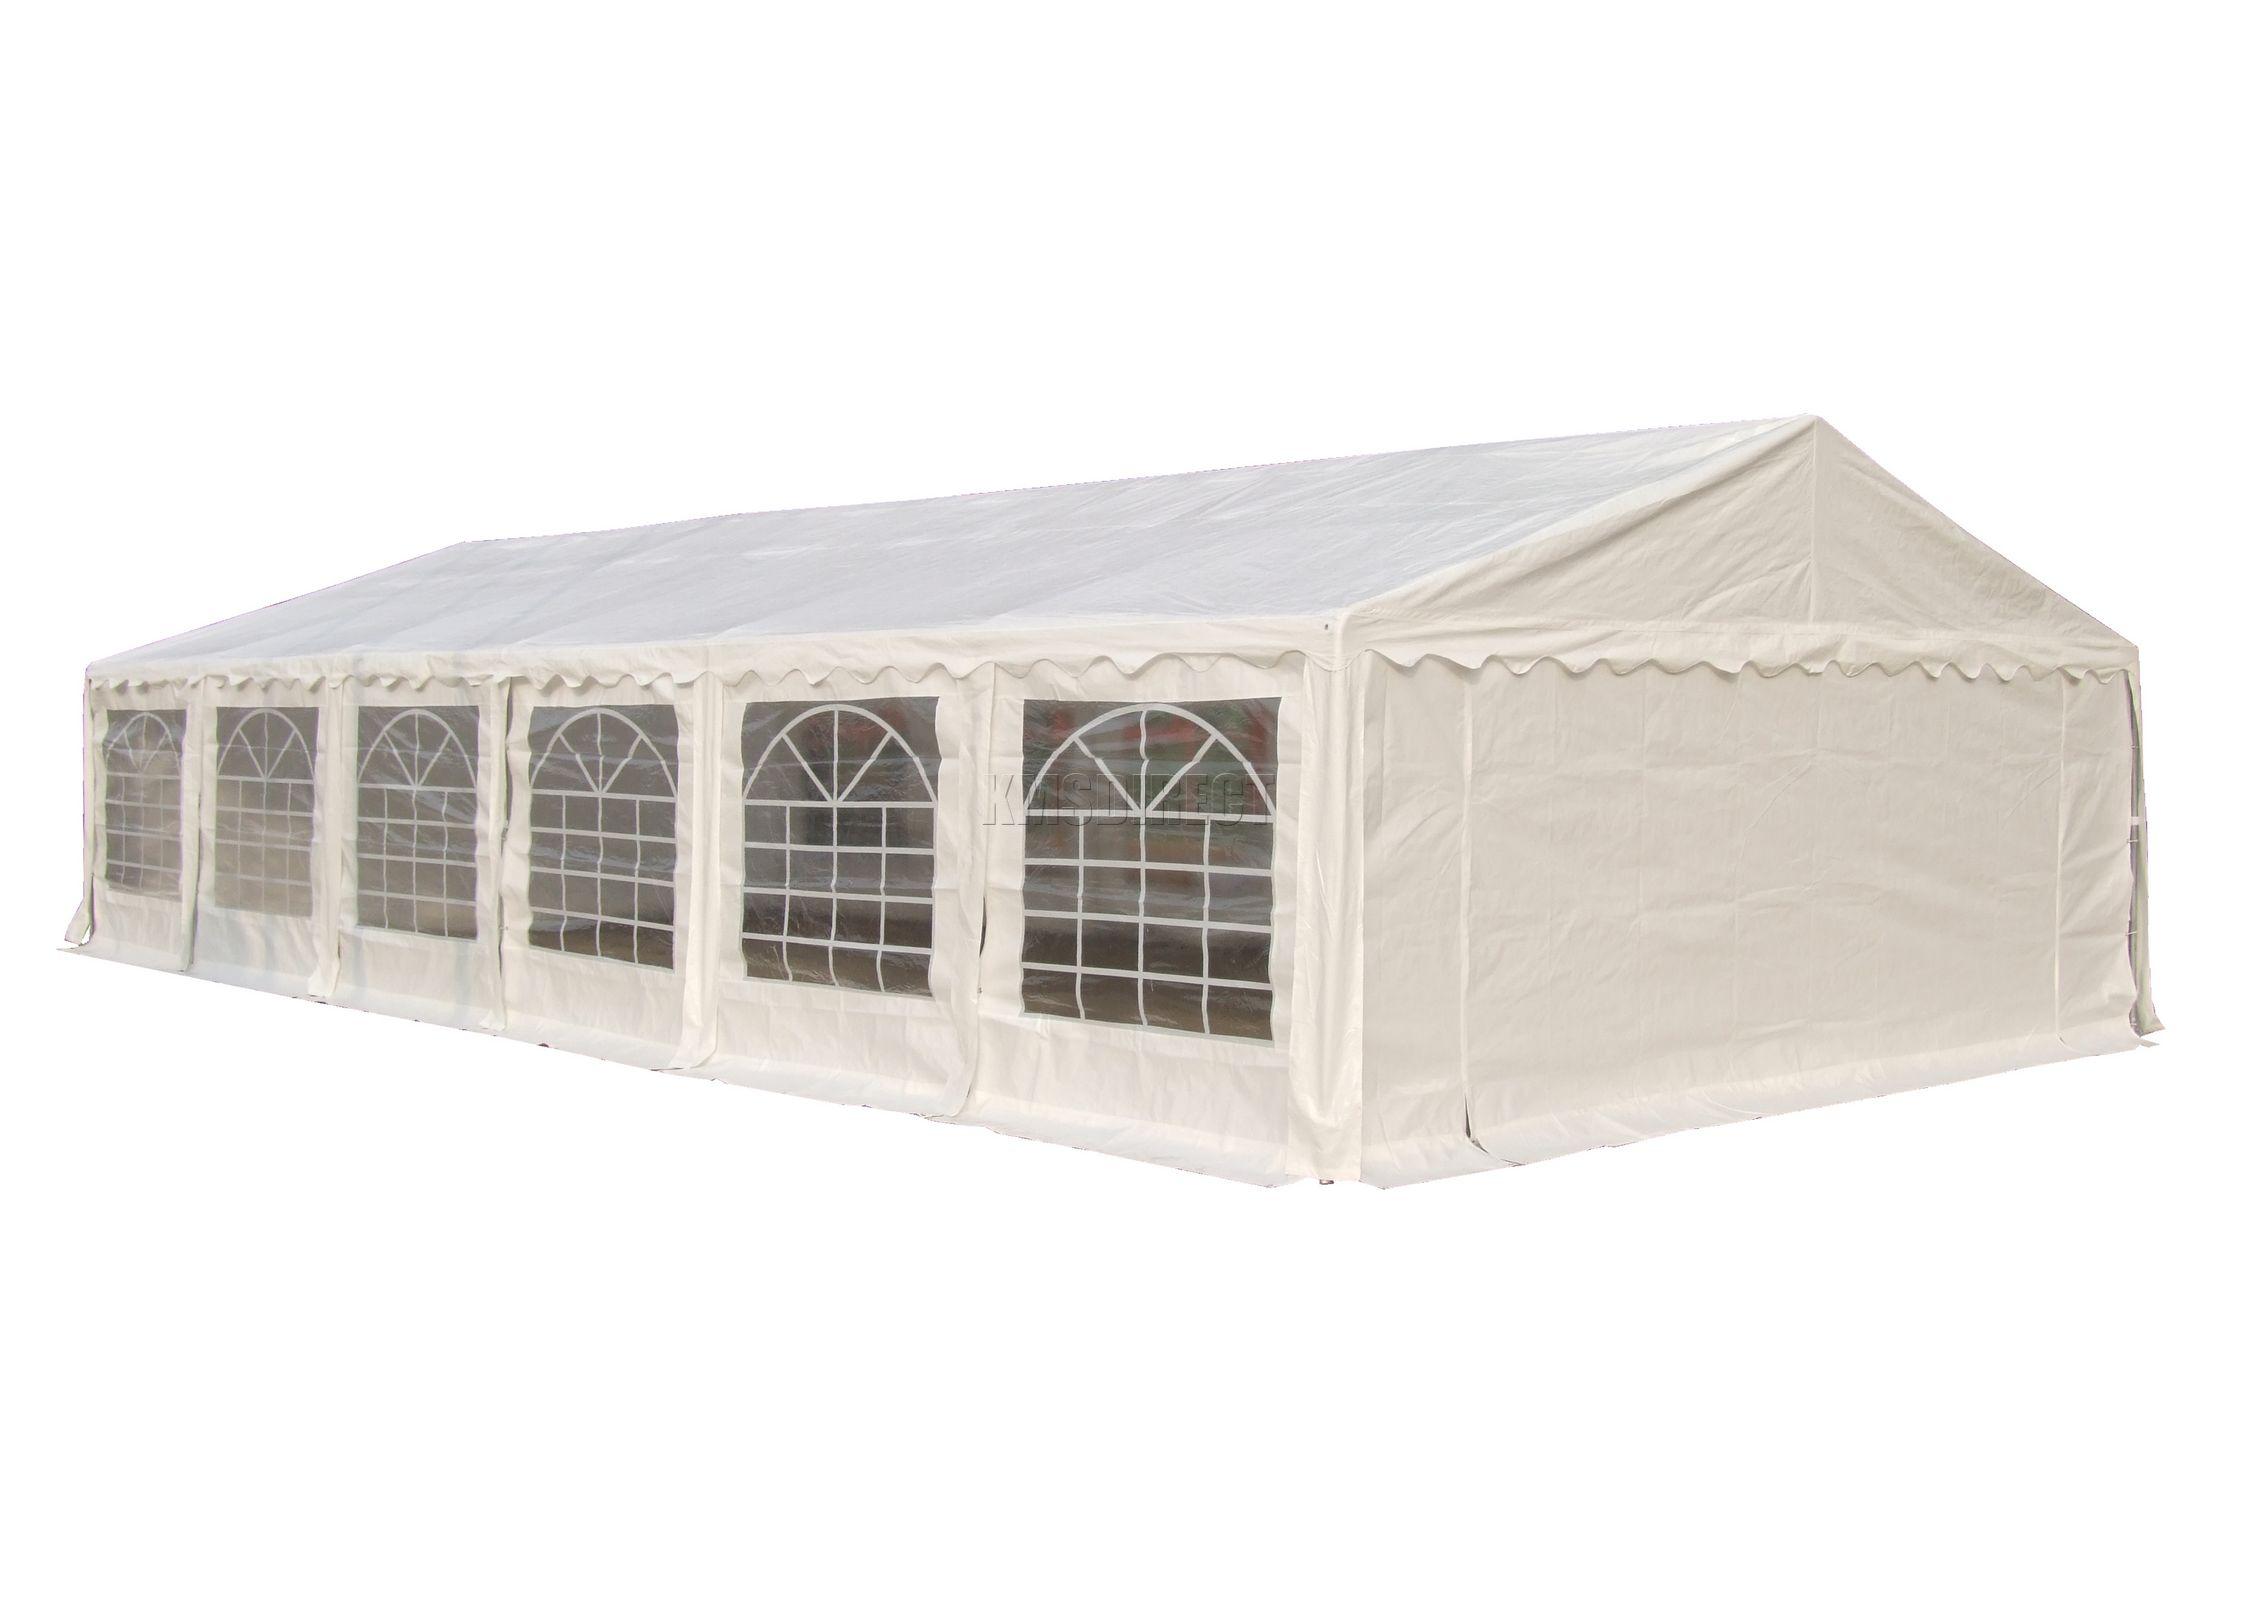 Sentinel FoxHunter Outdoor 6m X 12m Heavy Duty Wedding Party Tent Marquee Gazebo White